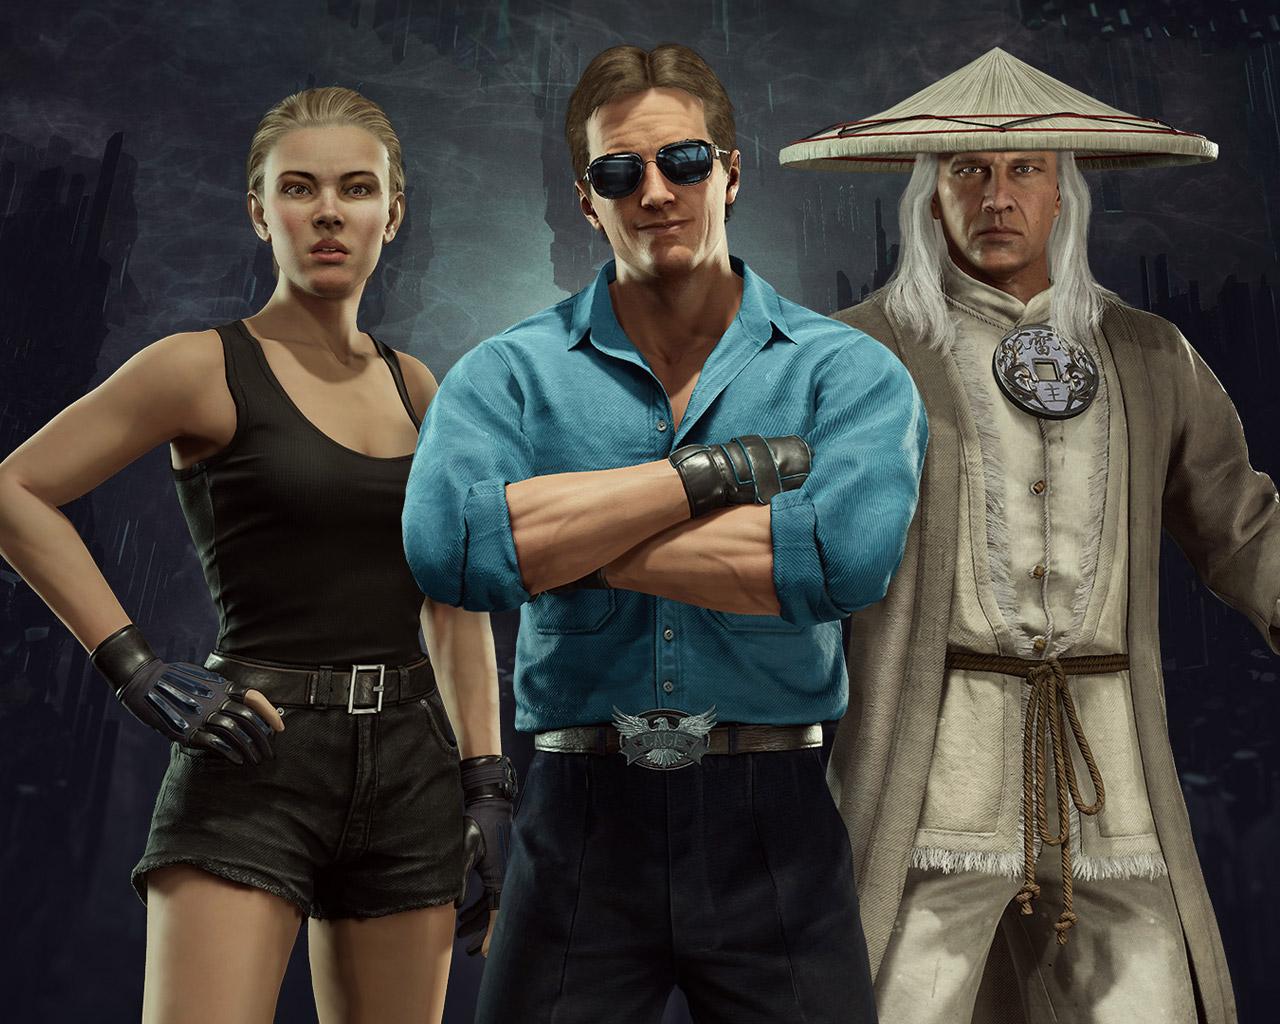 Free Mortal Kombat 11 Wallpaper in 1280x1024